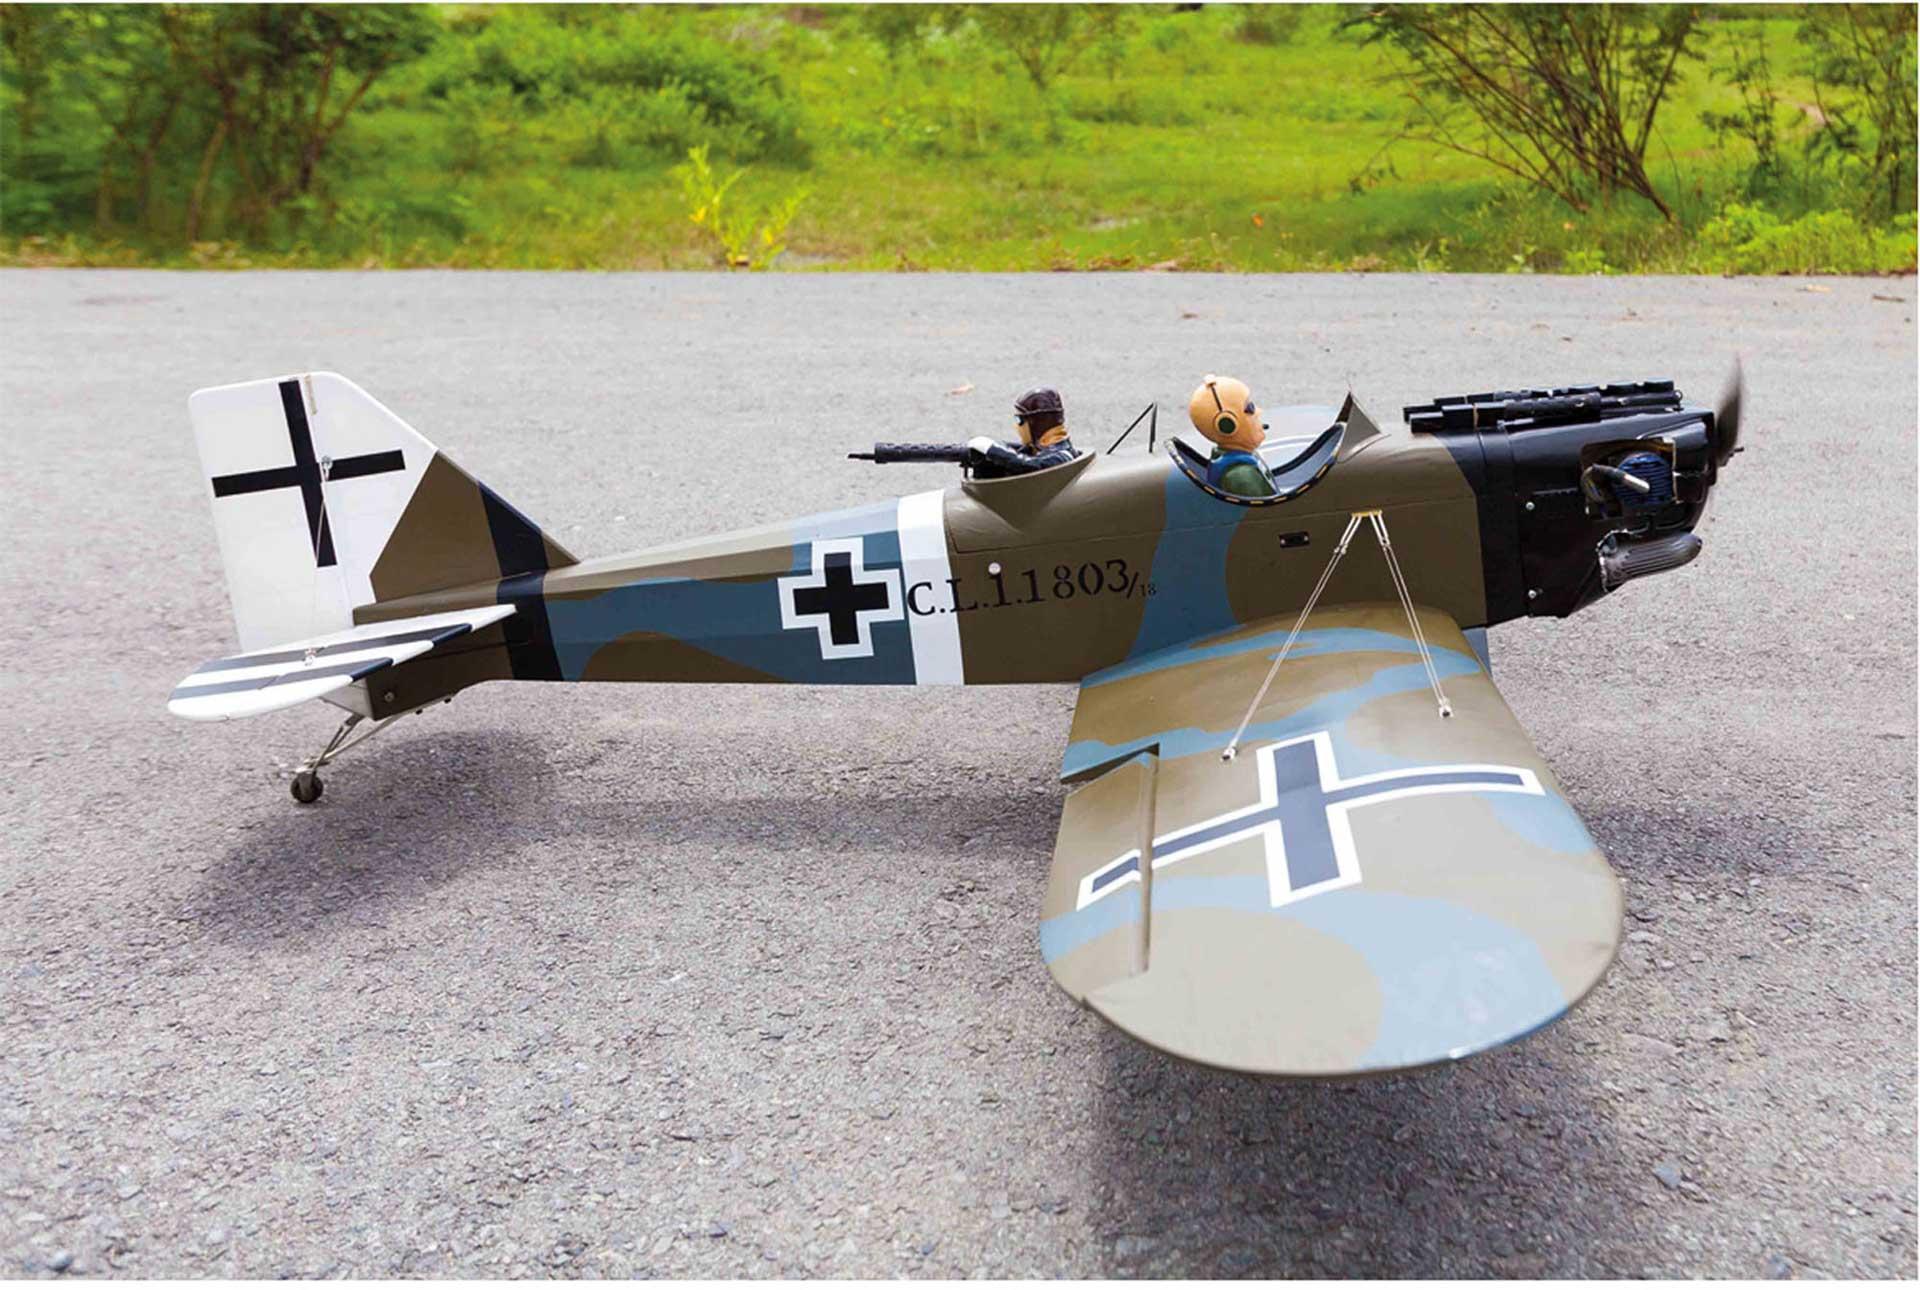 SG-MODELS JUNKERS CL-1 (J 10) WARBIRD ARF